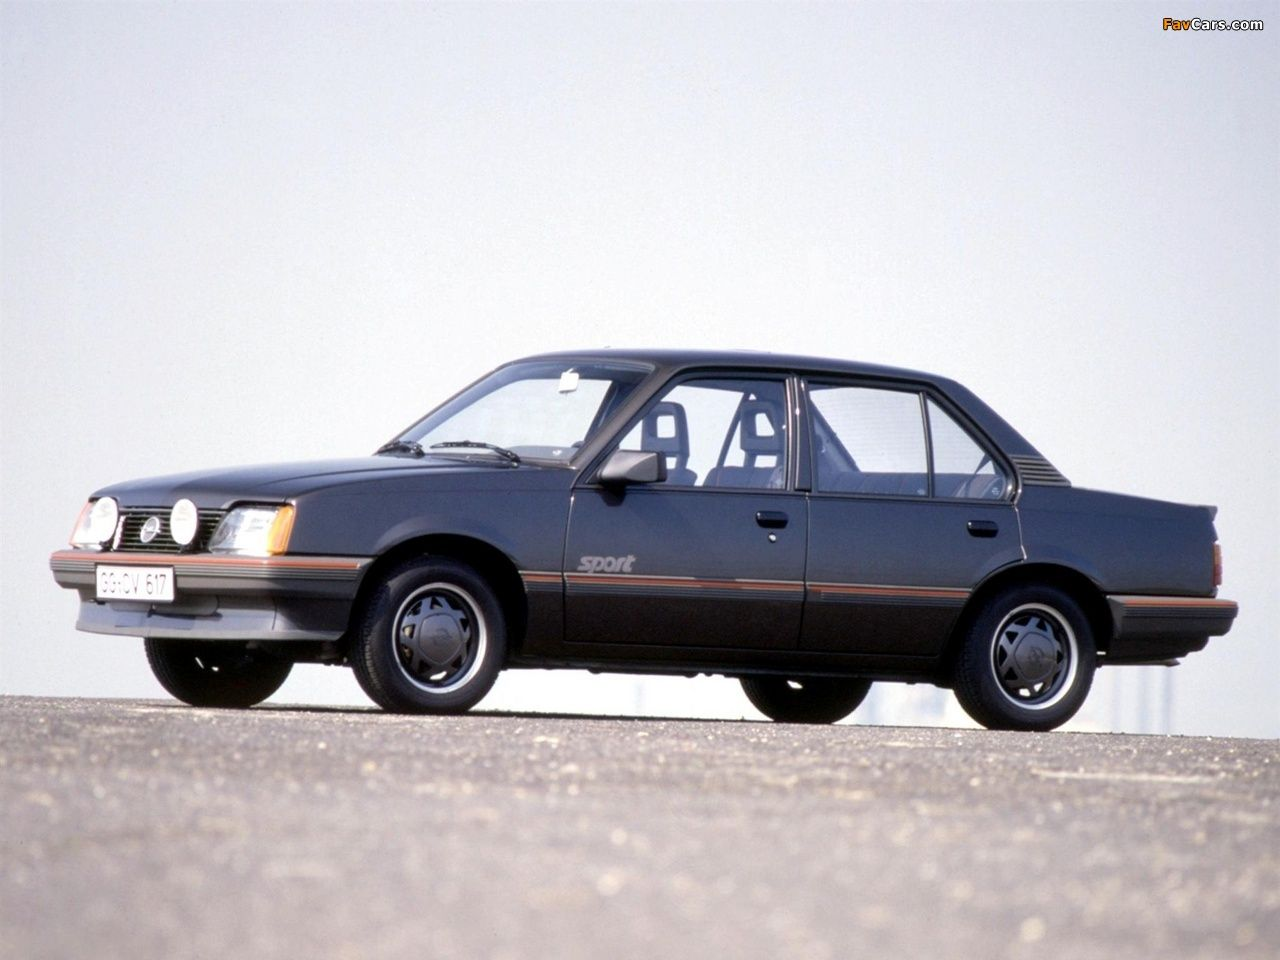 1984 opel ascona c sport classic cars pinterest opel manta car tuning and cars. Black Bedroom Furniture Sets. Home Design Ideas